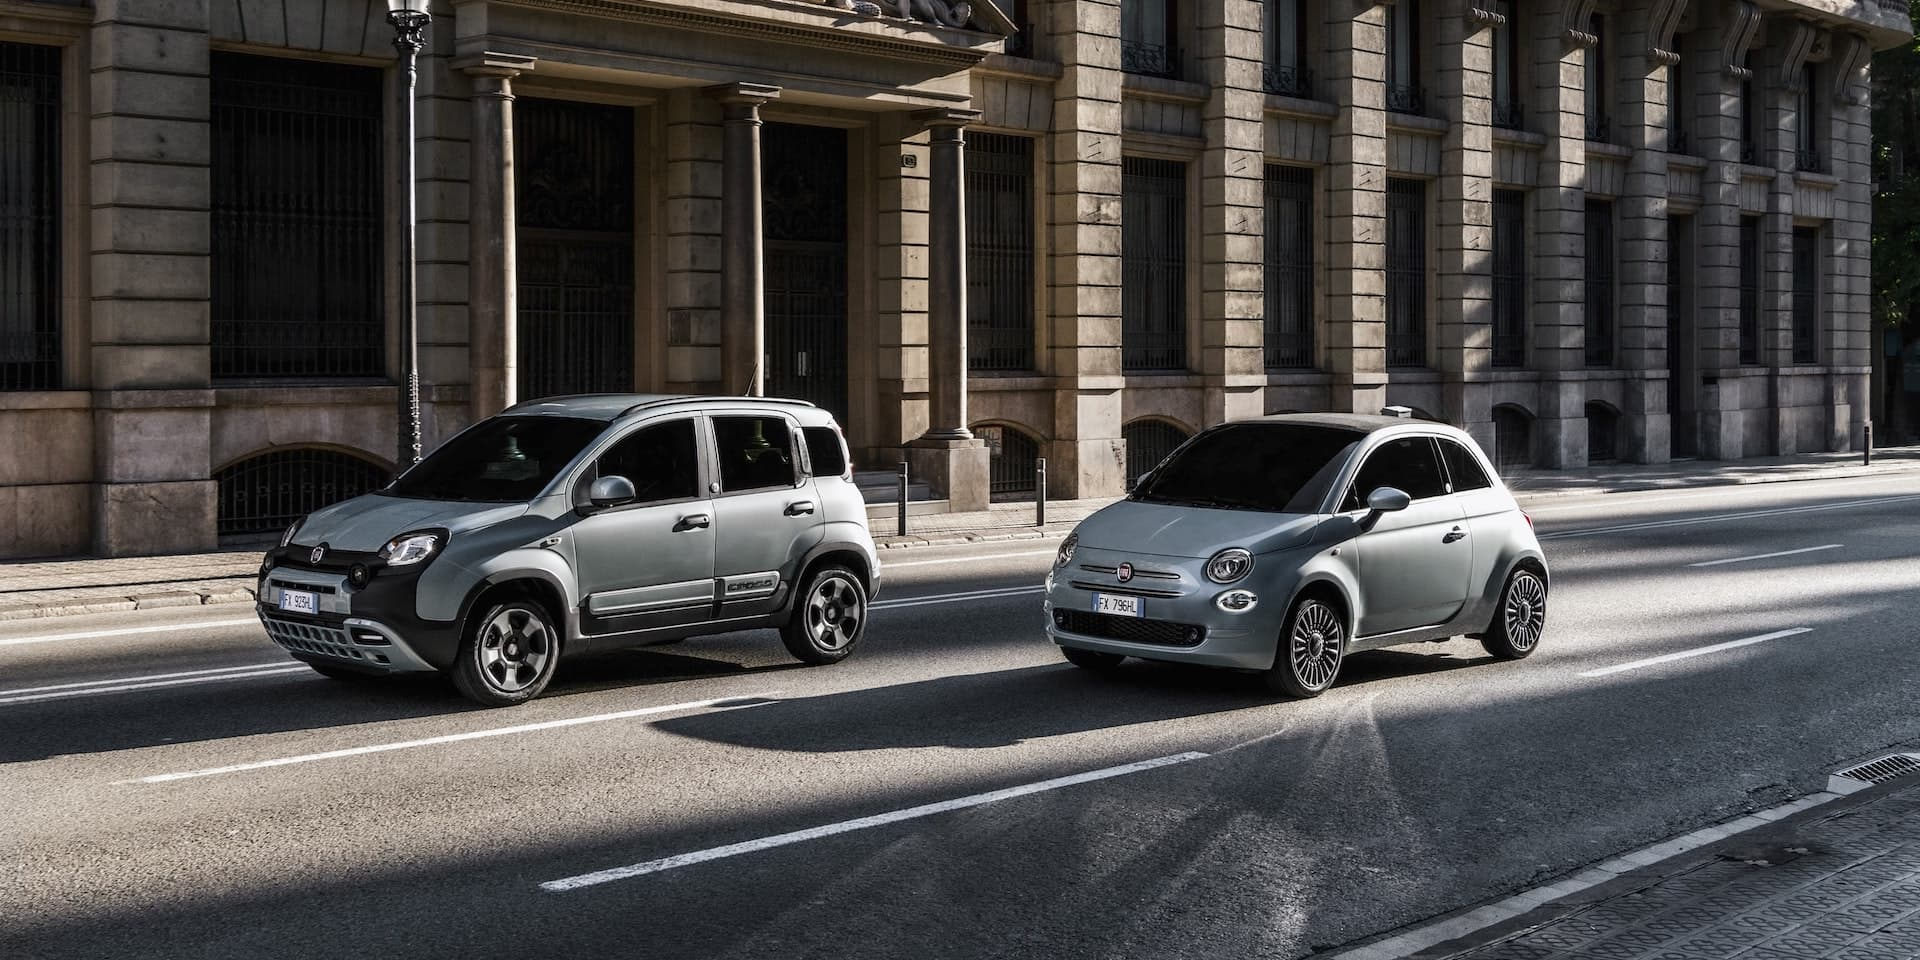 Fiat 500 and Fiat Panda mild hybrid models | The Car Expert